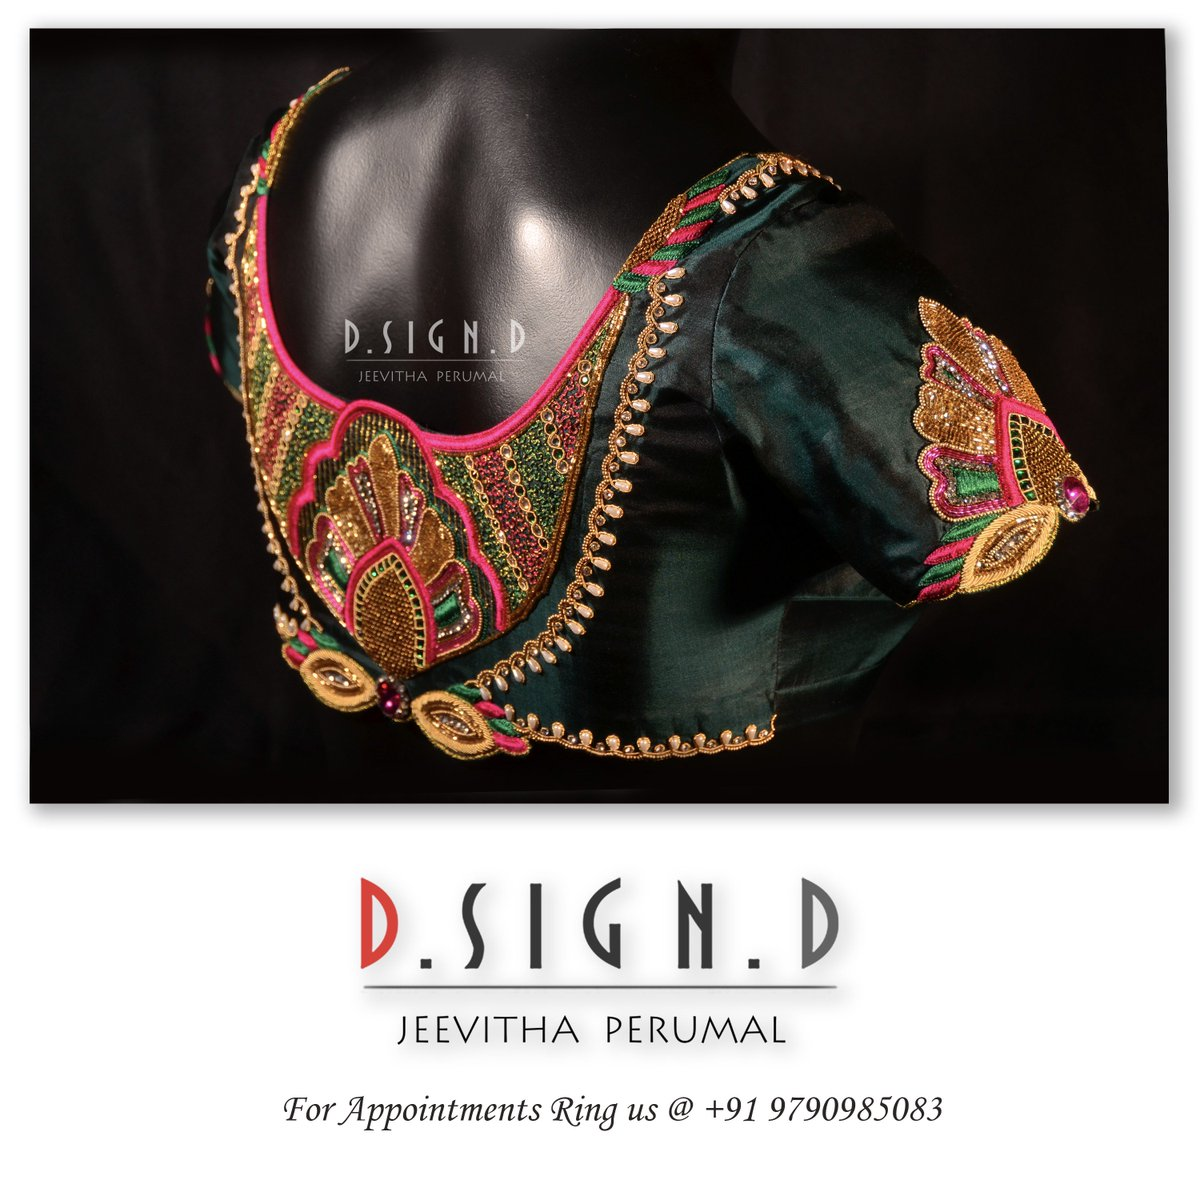 bf9812e0c22d52 green stone work bridal blouse from @Dsignd2 #dsignd #dsigndstudio  #jeevithaperumal #bridalblouse